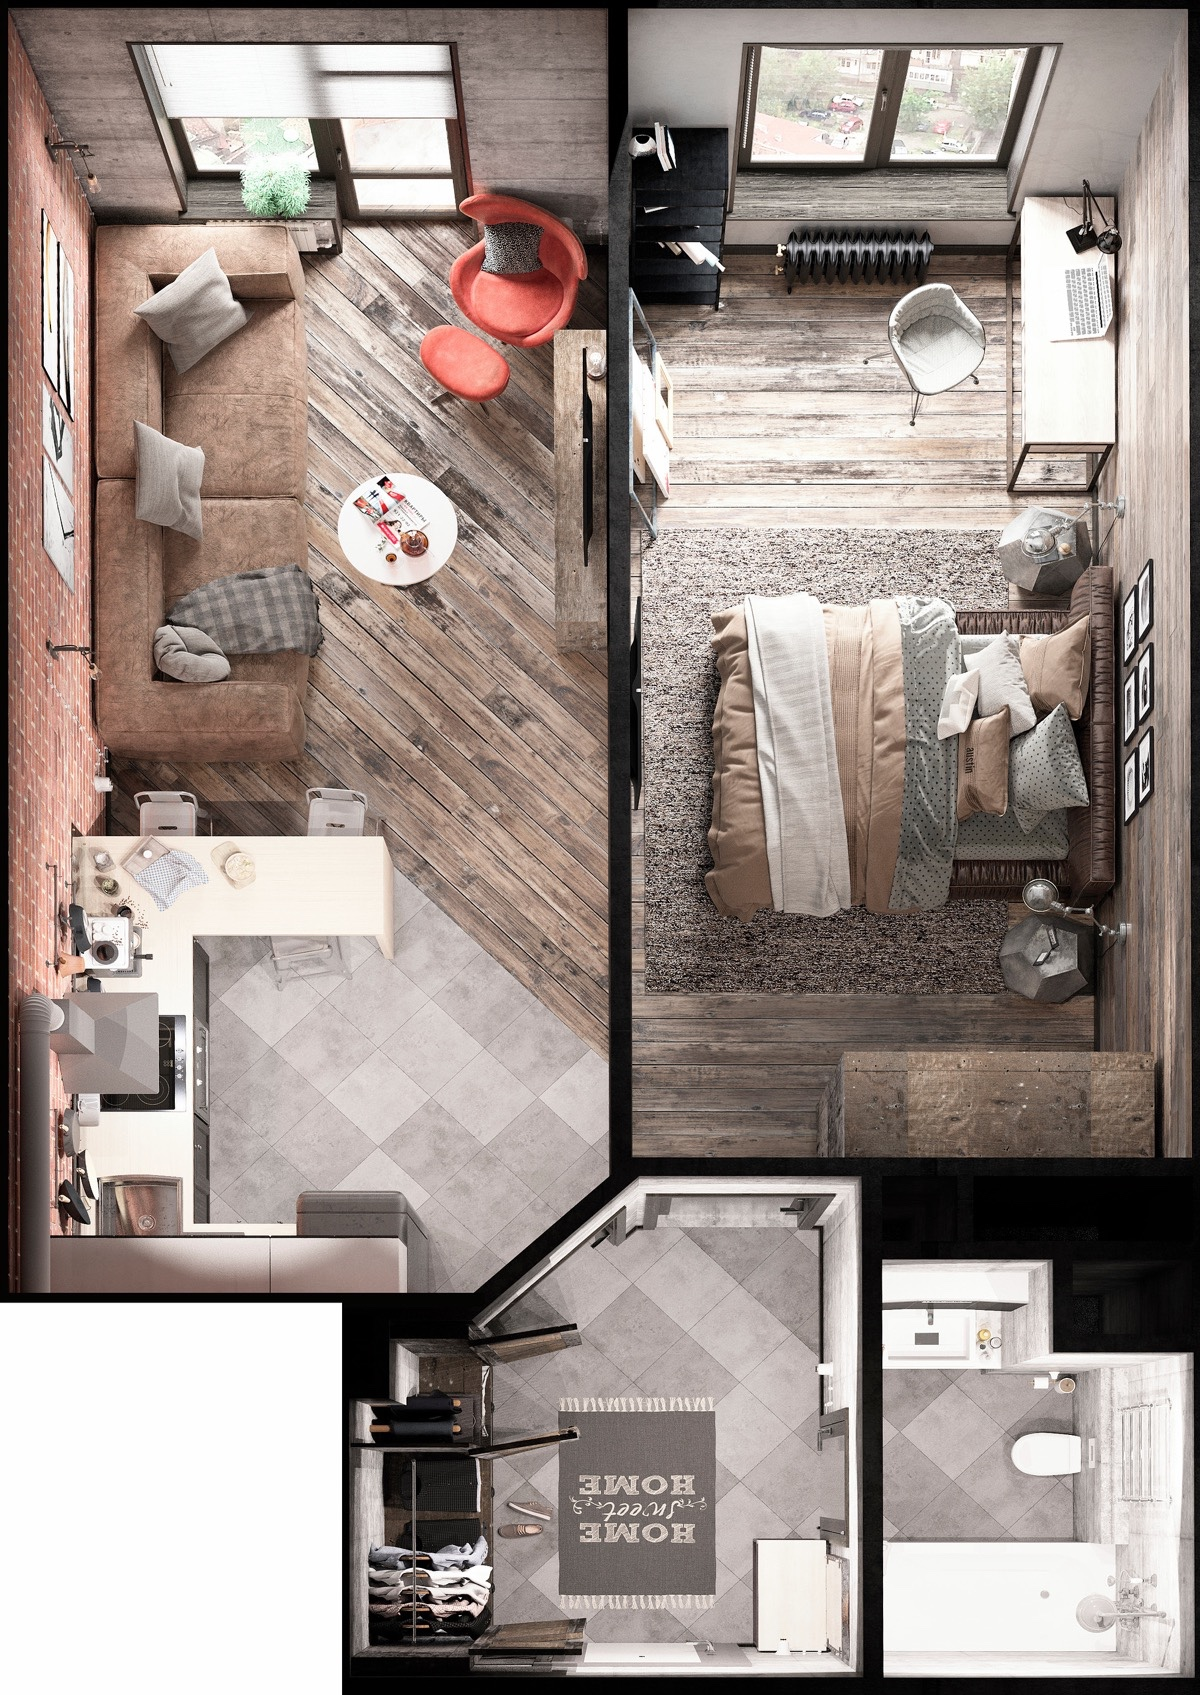 plan apartament mic amenajat creativ